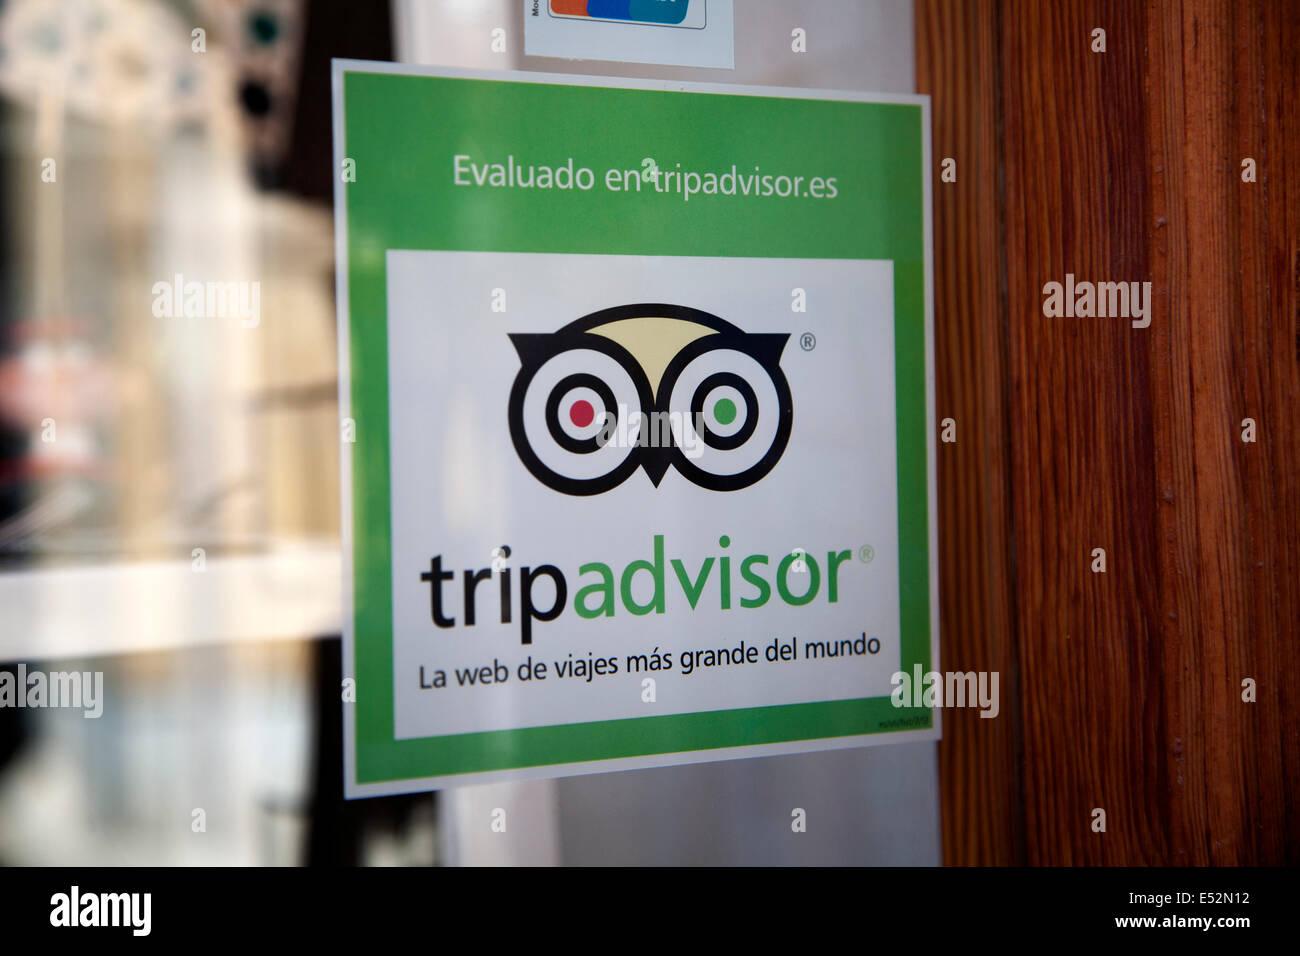 Pegatina de ventana de vidrio de Trip Advisor, Granada, España Imagen De Stock